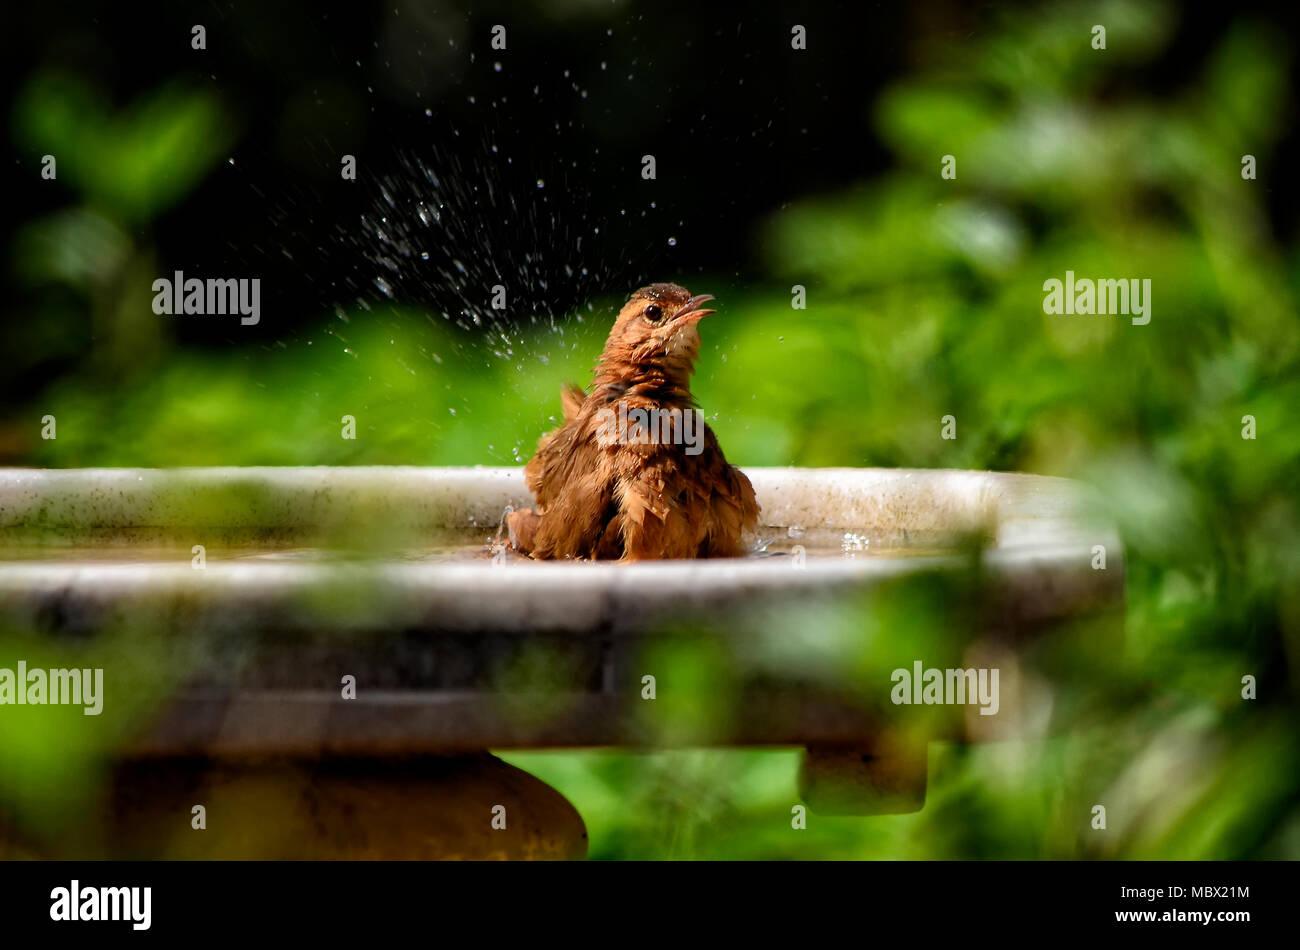 Bird having a bath - Stock Image